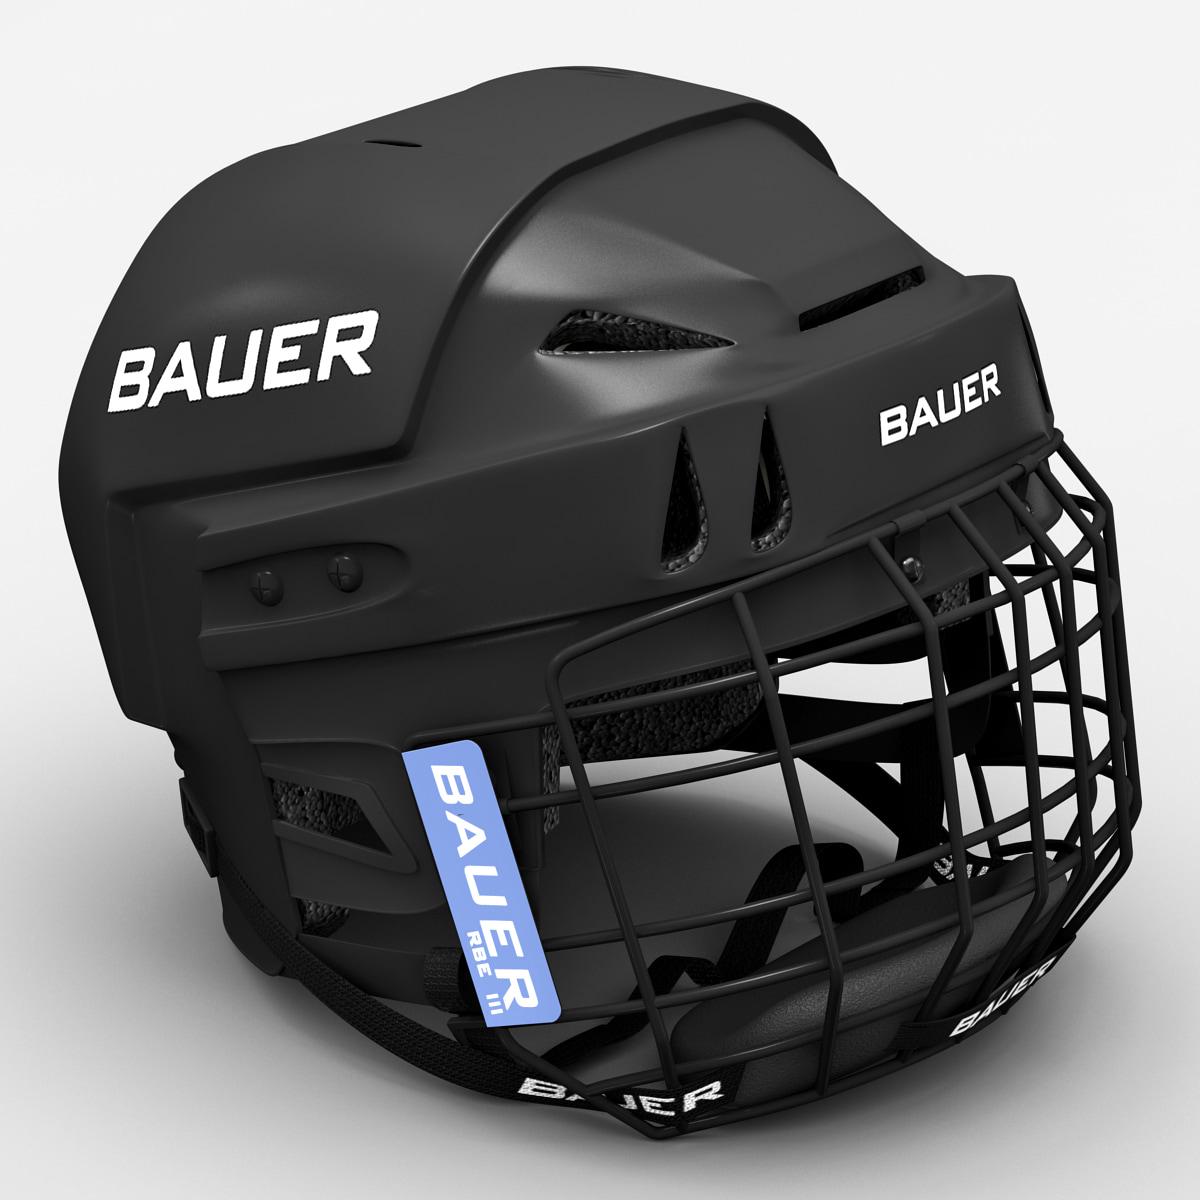 Hockey_Helmet_Bauer_M104_Combo_001.jpg